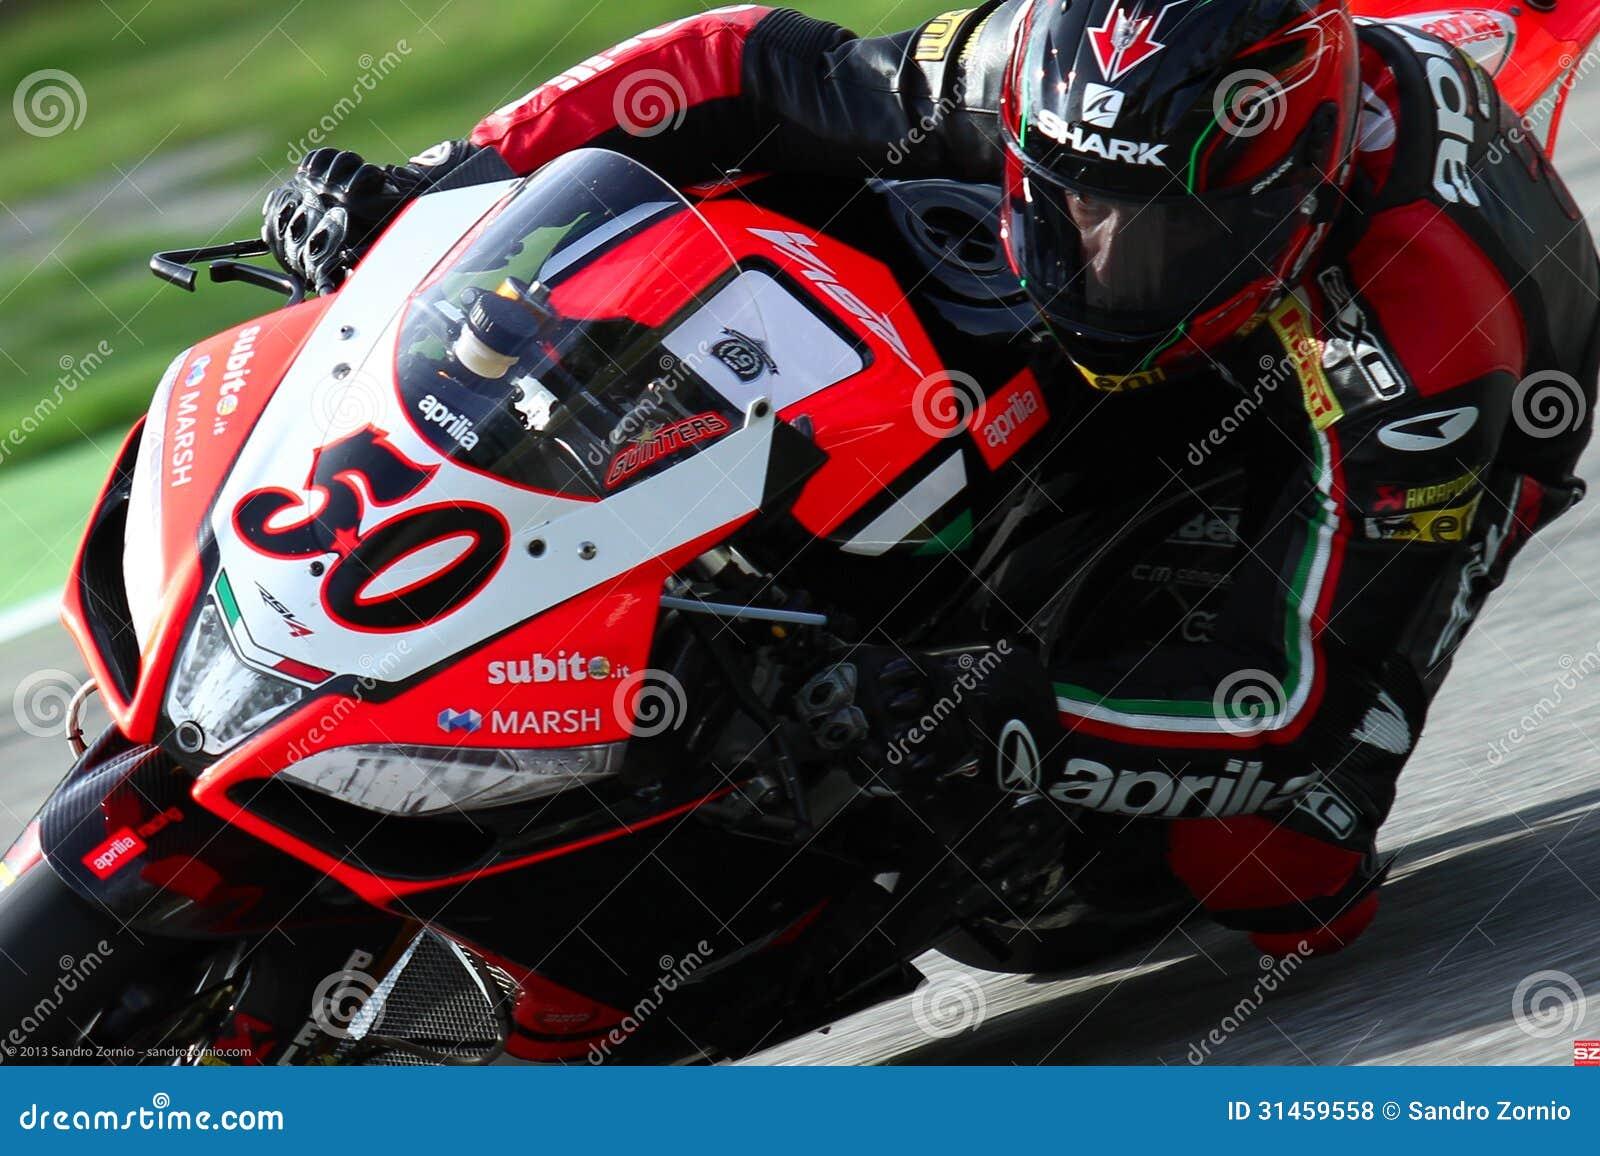 Sylvain Guintoli #50 on Aprilia RSV4 1000 Factory with Aprilia Racing Team Superbike WSBK